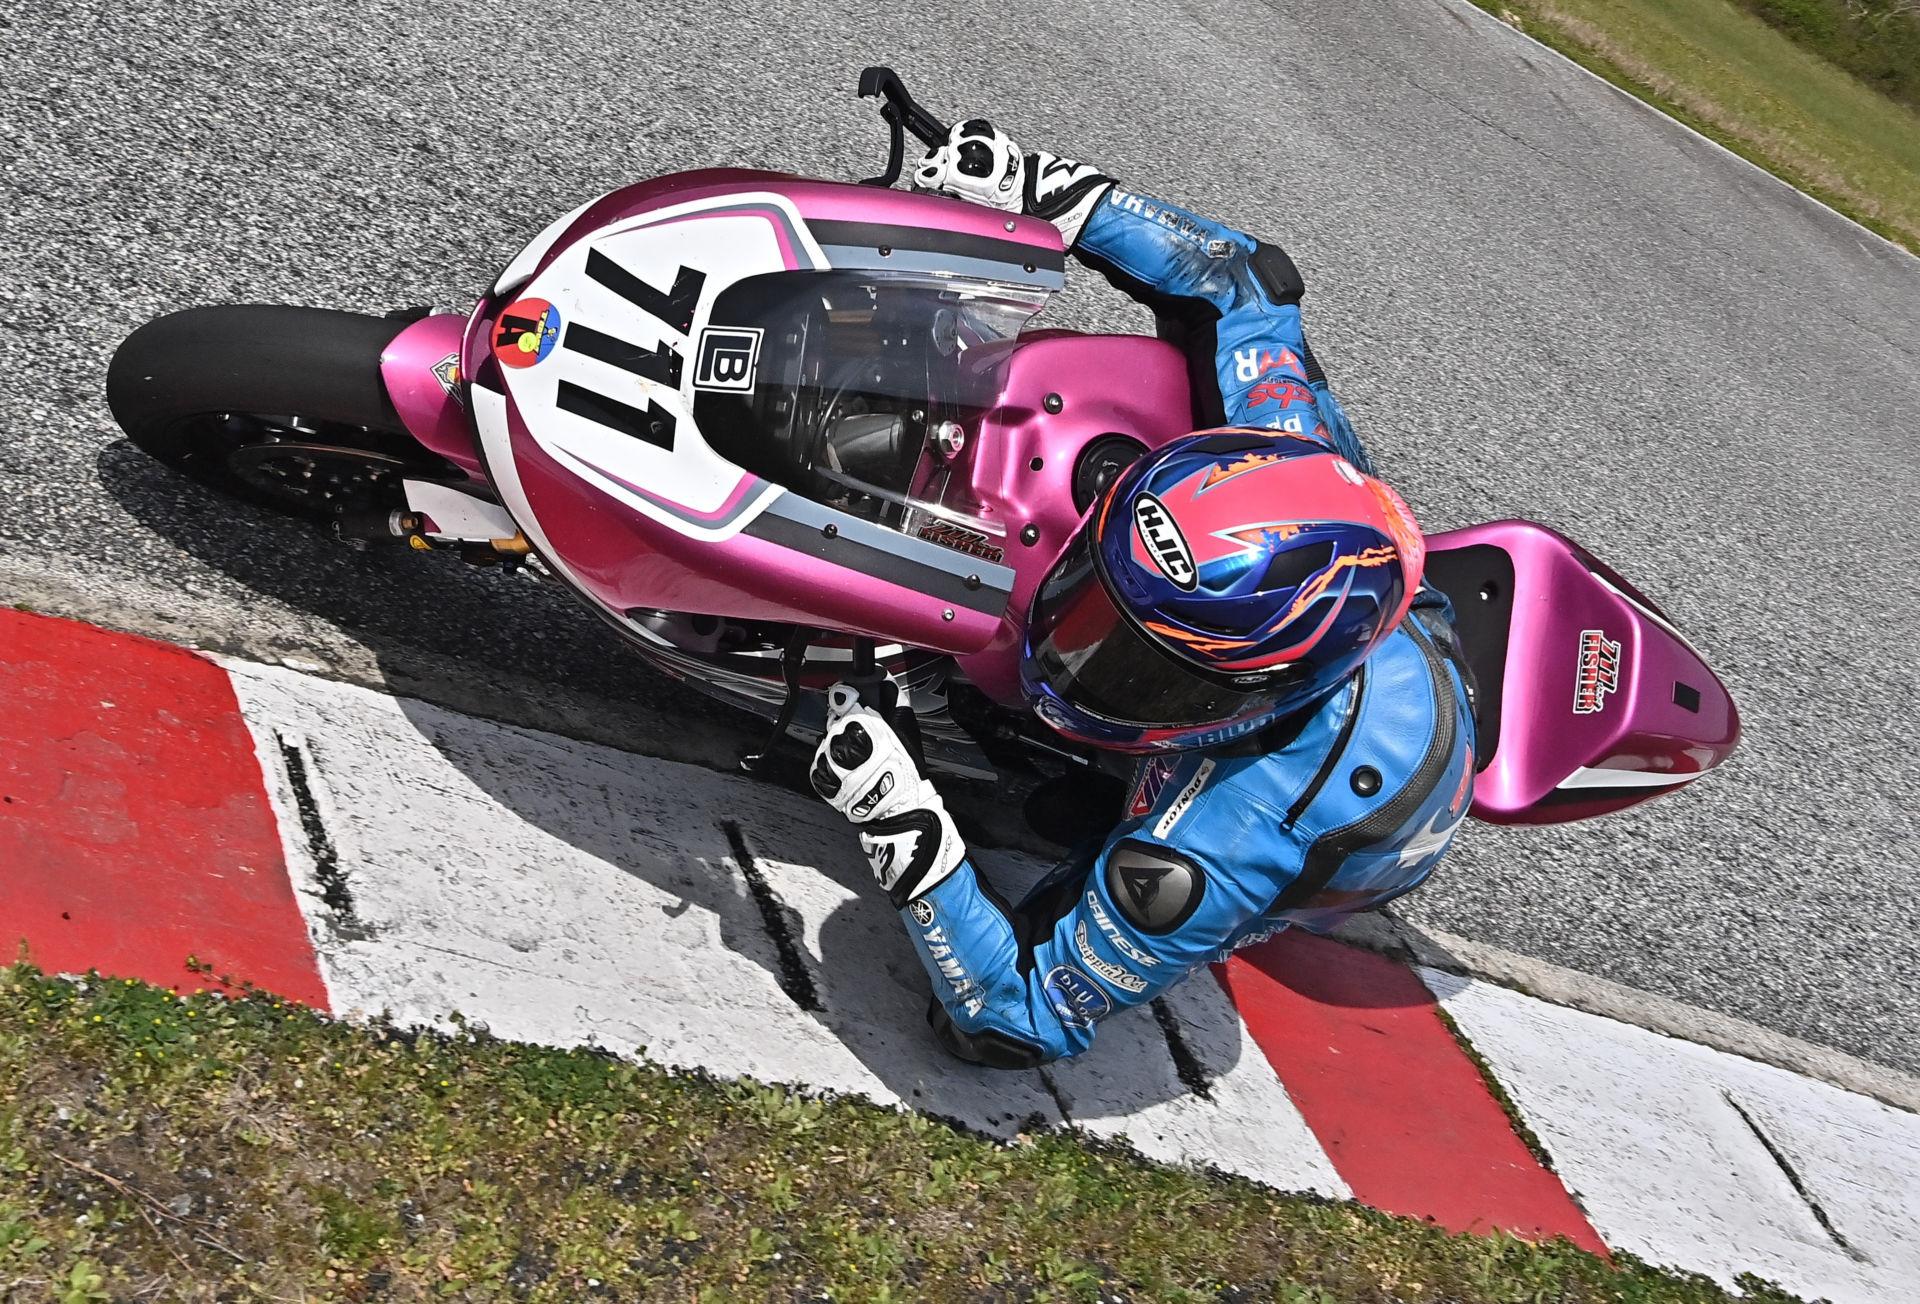 Jackson Blackmon (711) testing his new Yamaha MT-07 at Jennings GP. Photo courtesy JBR.